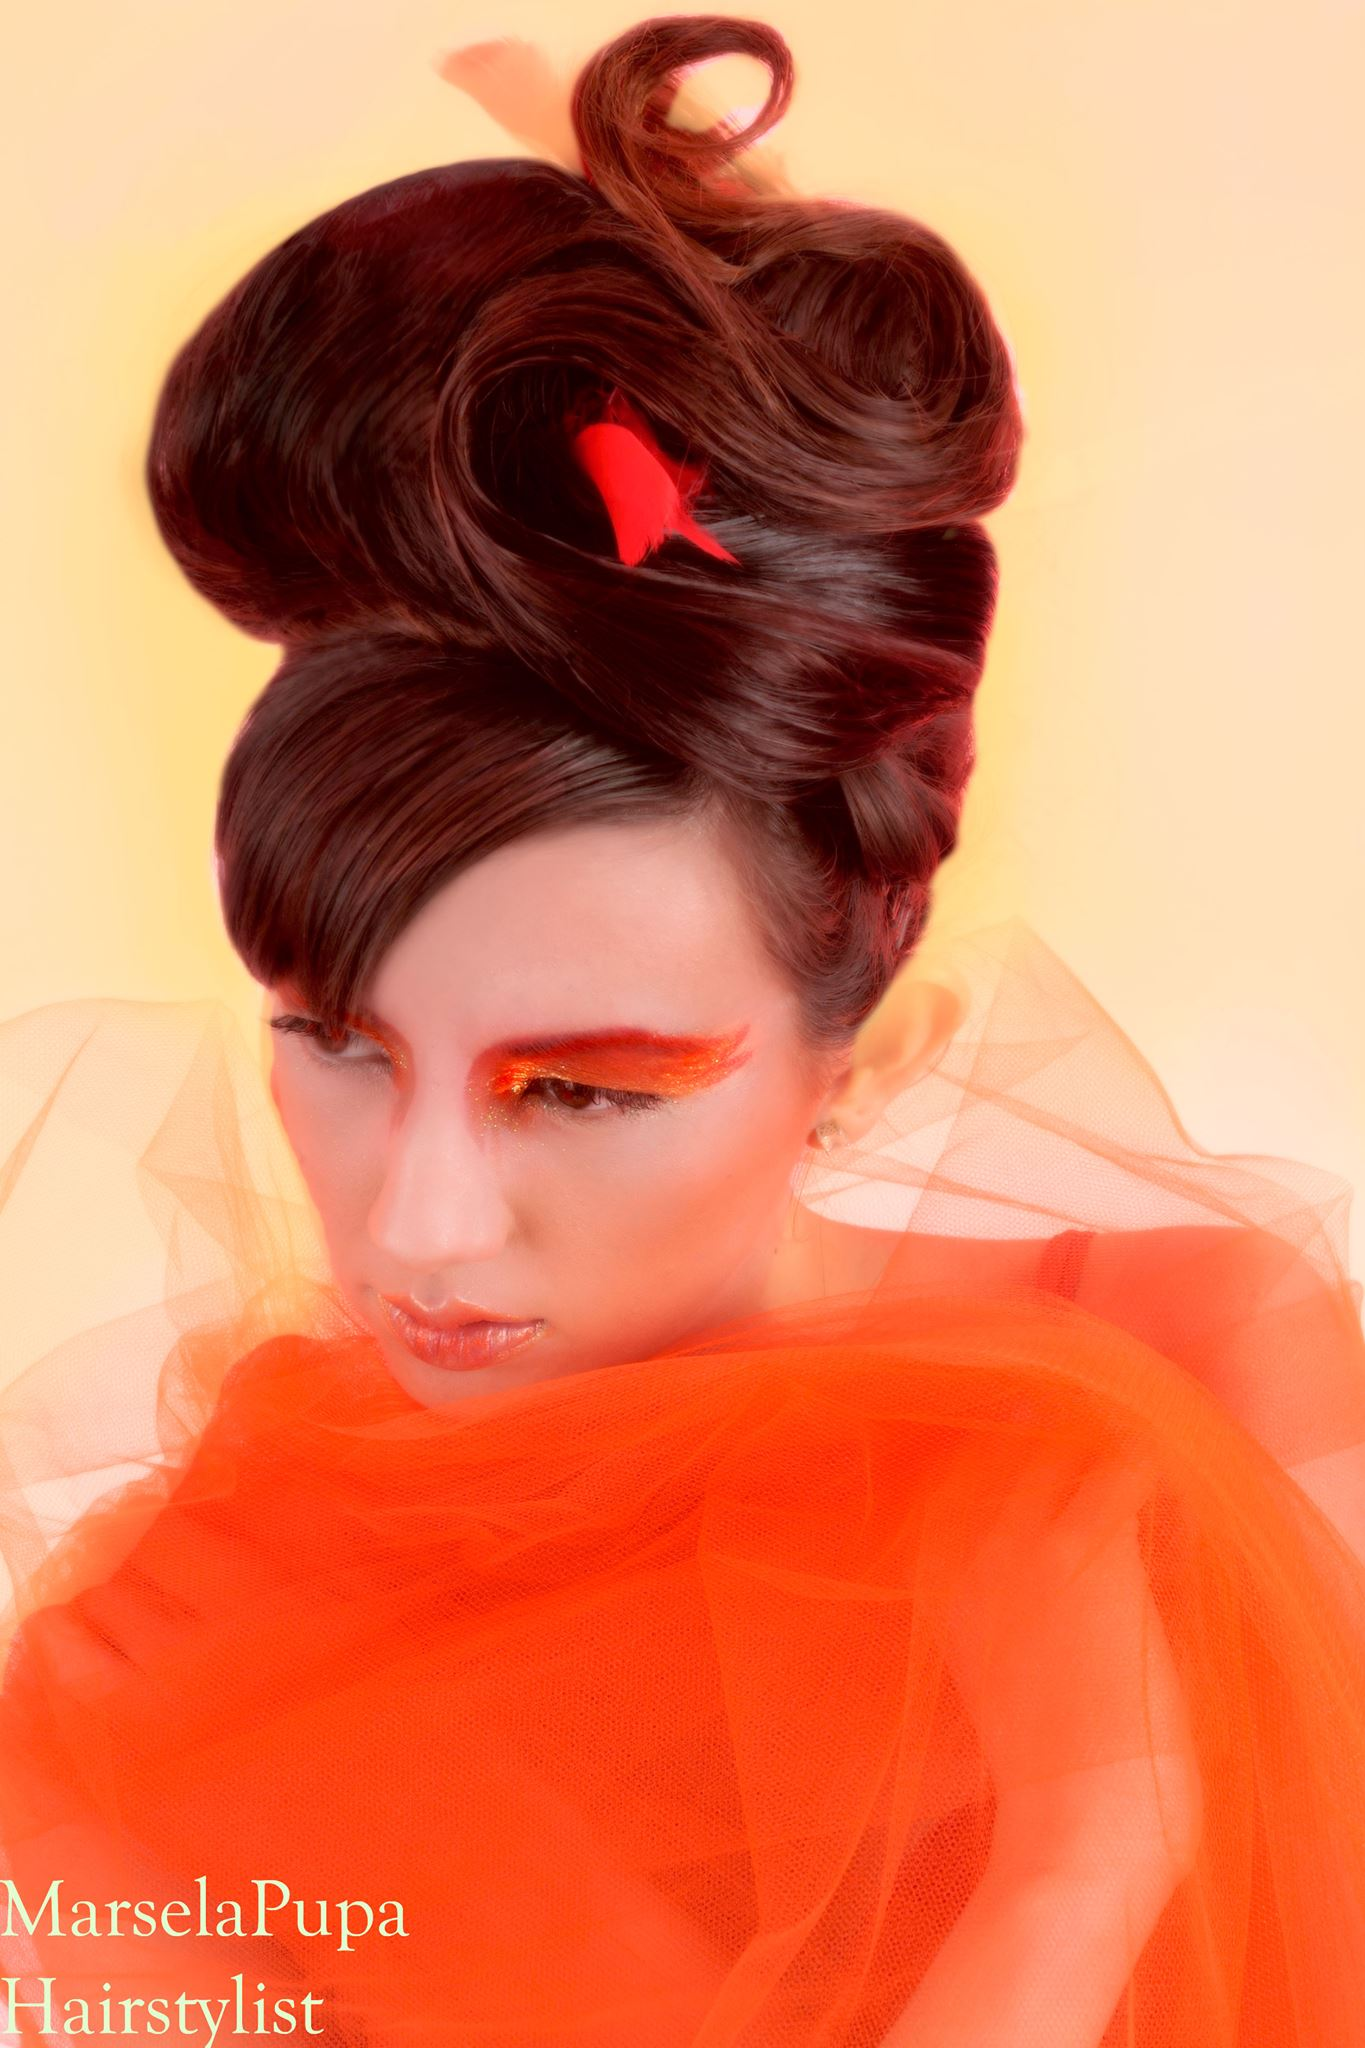 Fire Hairstyle - Marsela Pupa